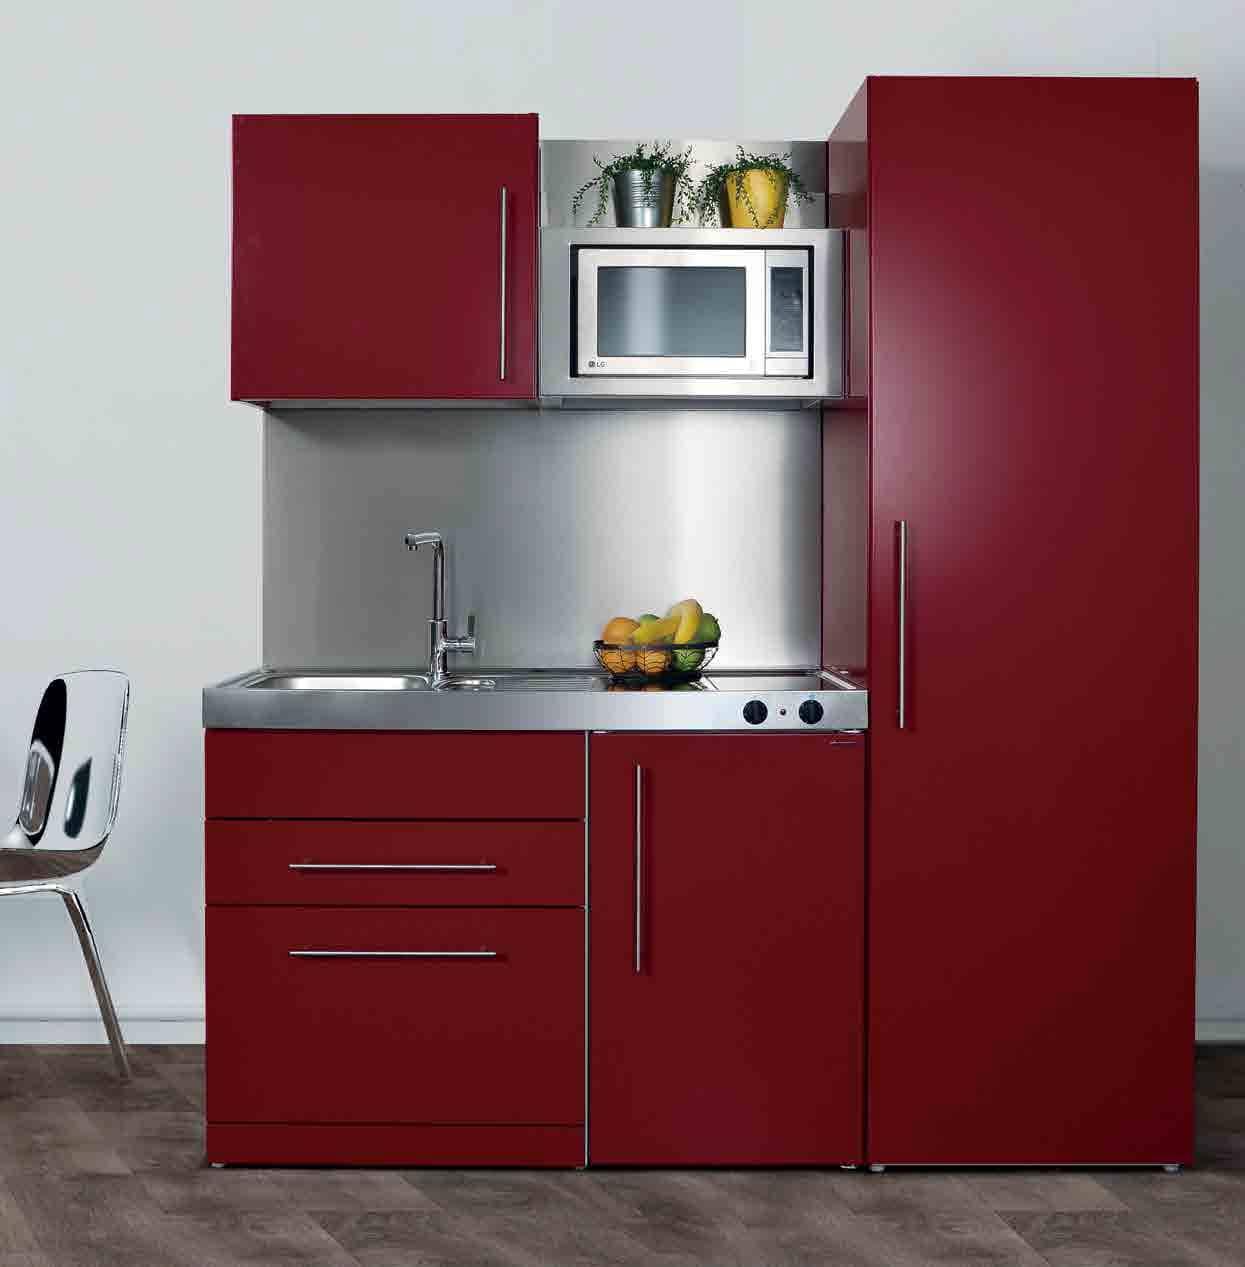 Full Size of Miniküche Kühlschrank Ausbauen Miniküche Mit Kühlschrank Möbel Boss Miniküche Kühlschrank Austauschen Miniküche Mit Kühlschrank Ikea Küche Miniküche Mit Kühlschrank